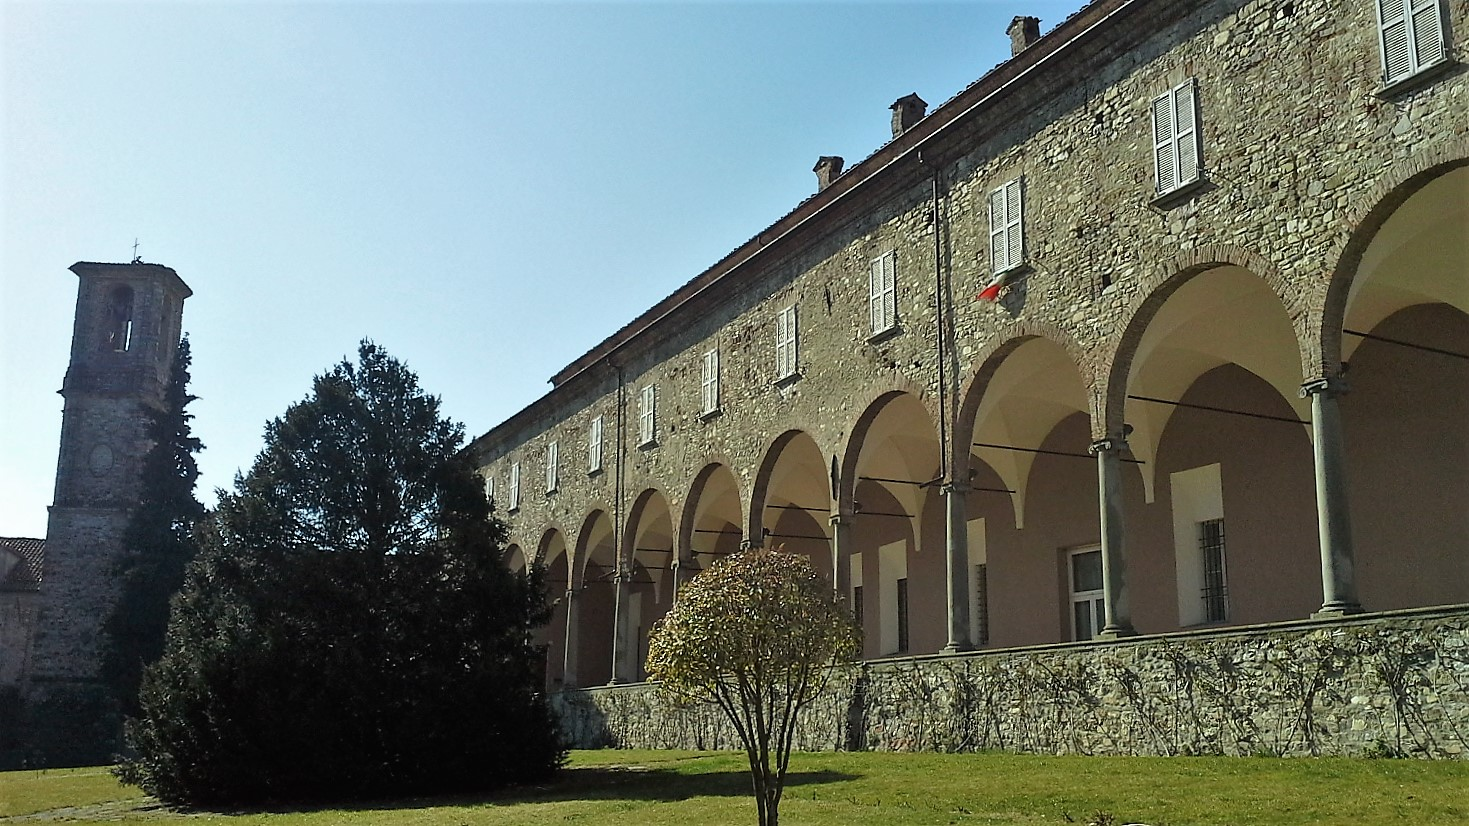 Convento san colombano bobbio